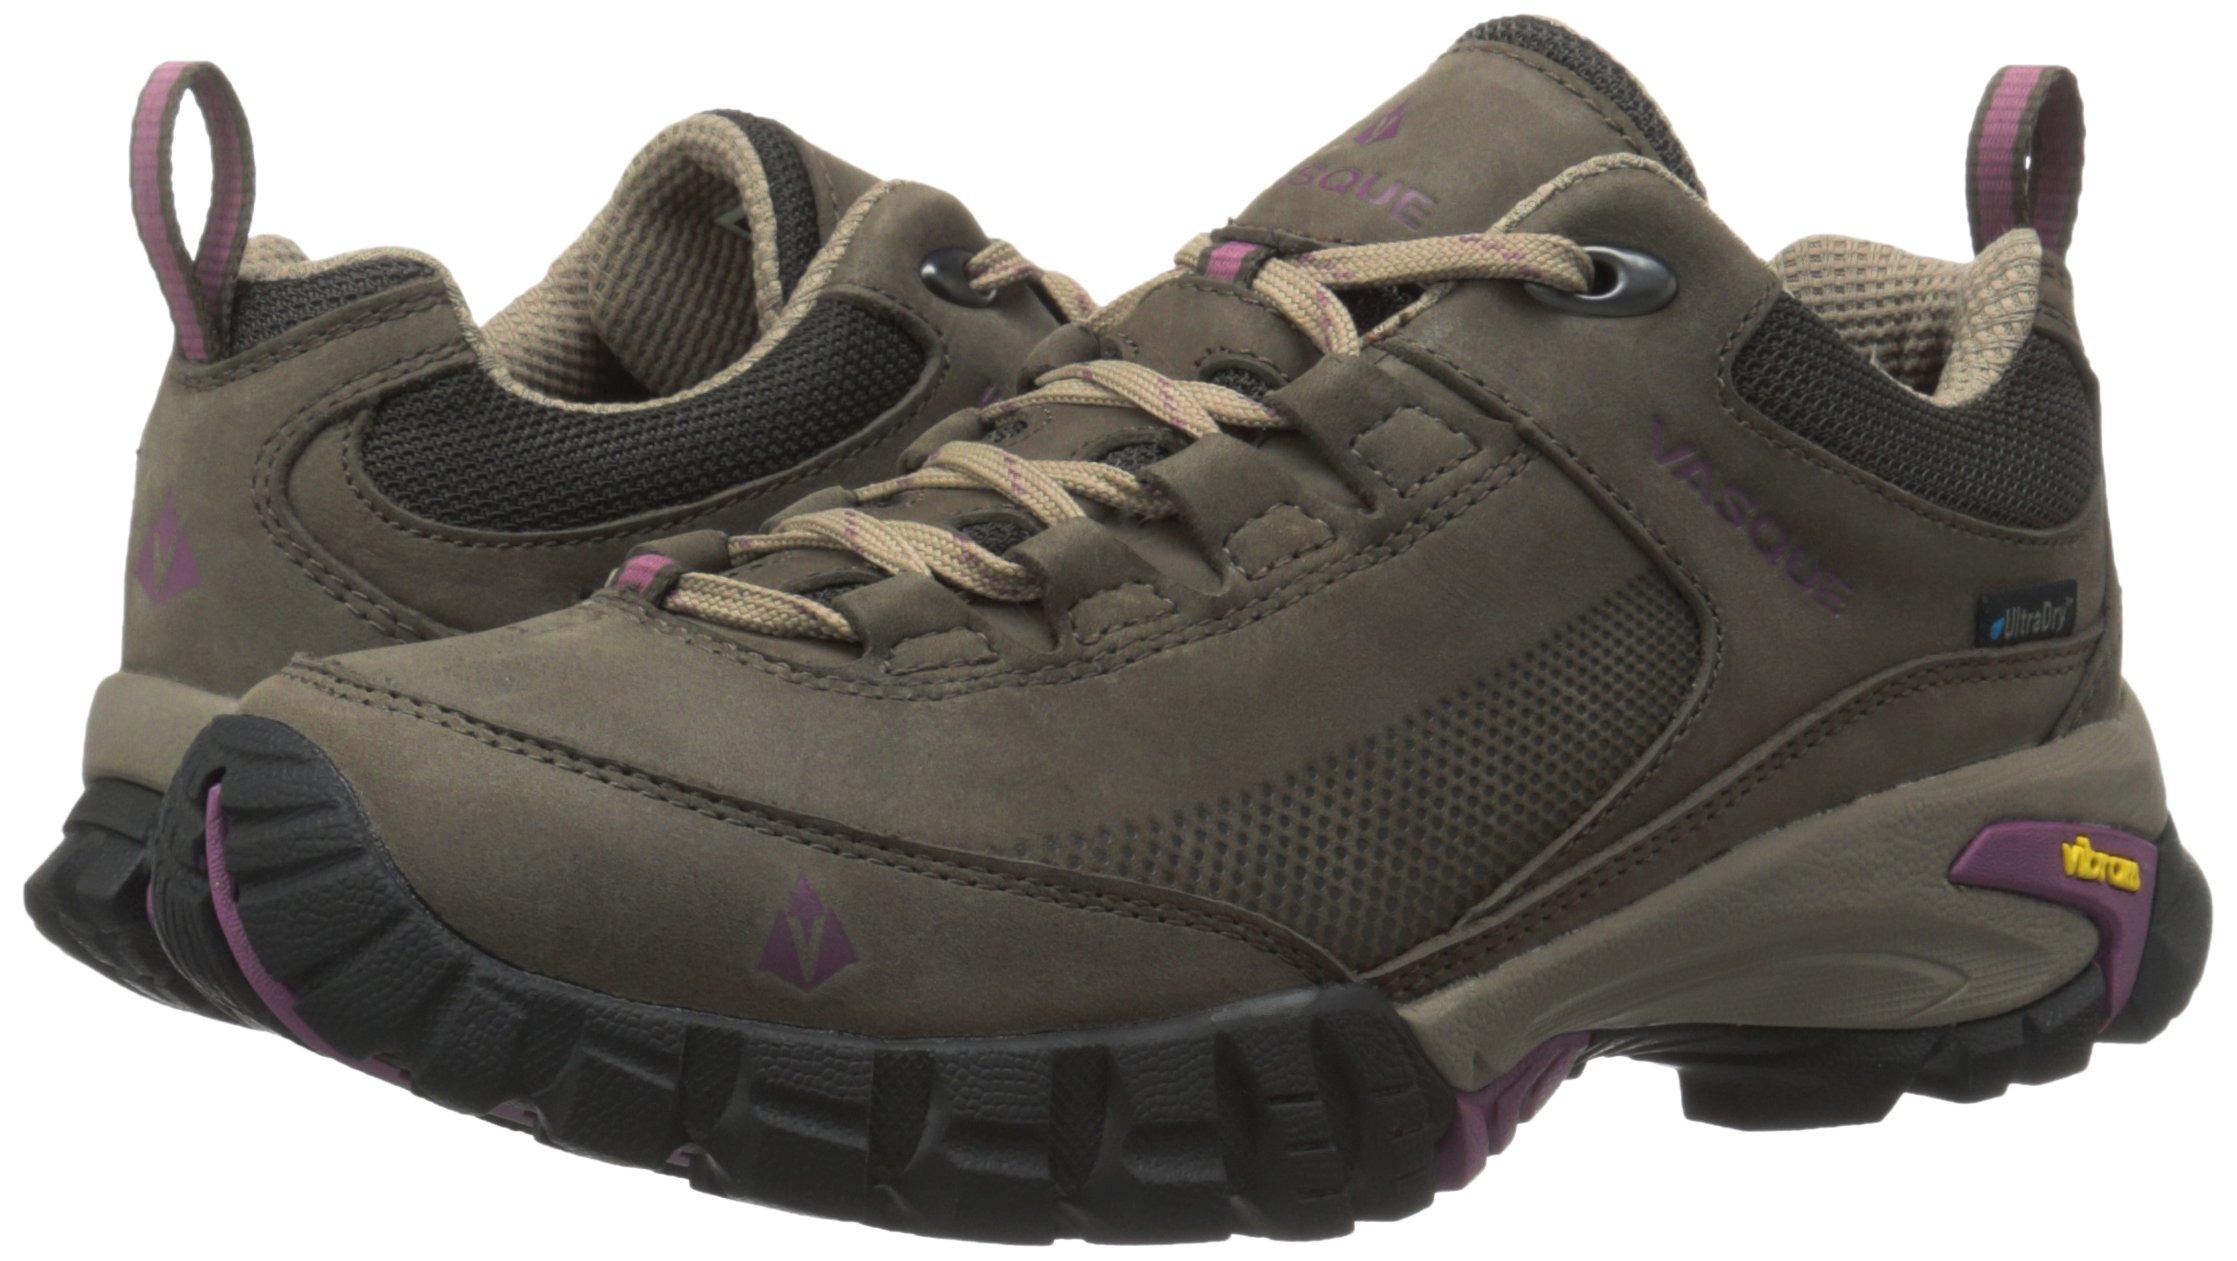 Vasque Women's Talus Trek Low UltraDry Hiking Shoe, Black Olive/Damson, 8.5 M US by Vasque (Image #6)